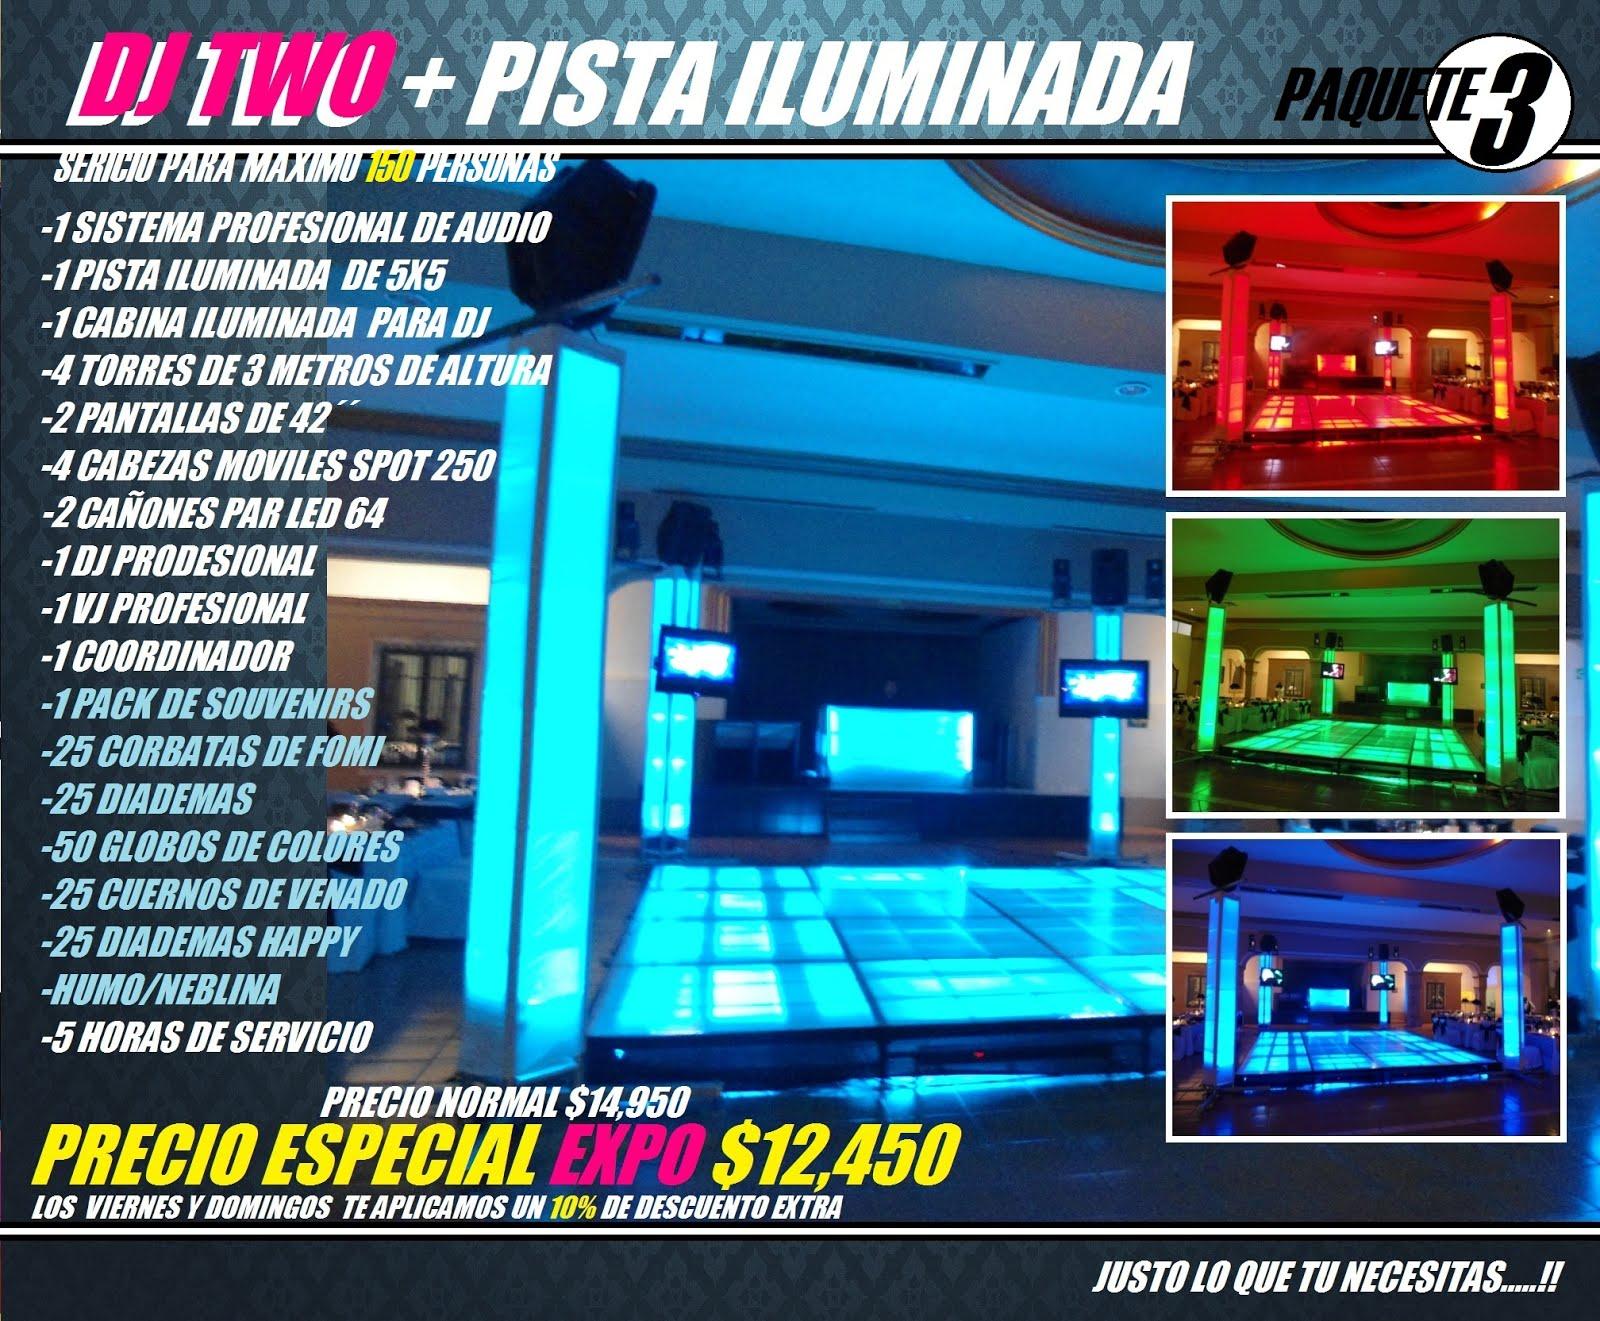 ECOMNOPACK 3 MAS PISTA DJ TWO LADO B